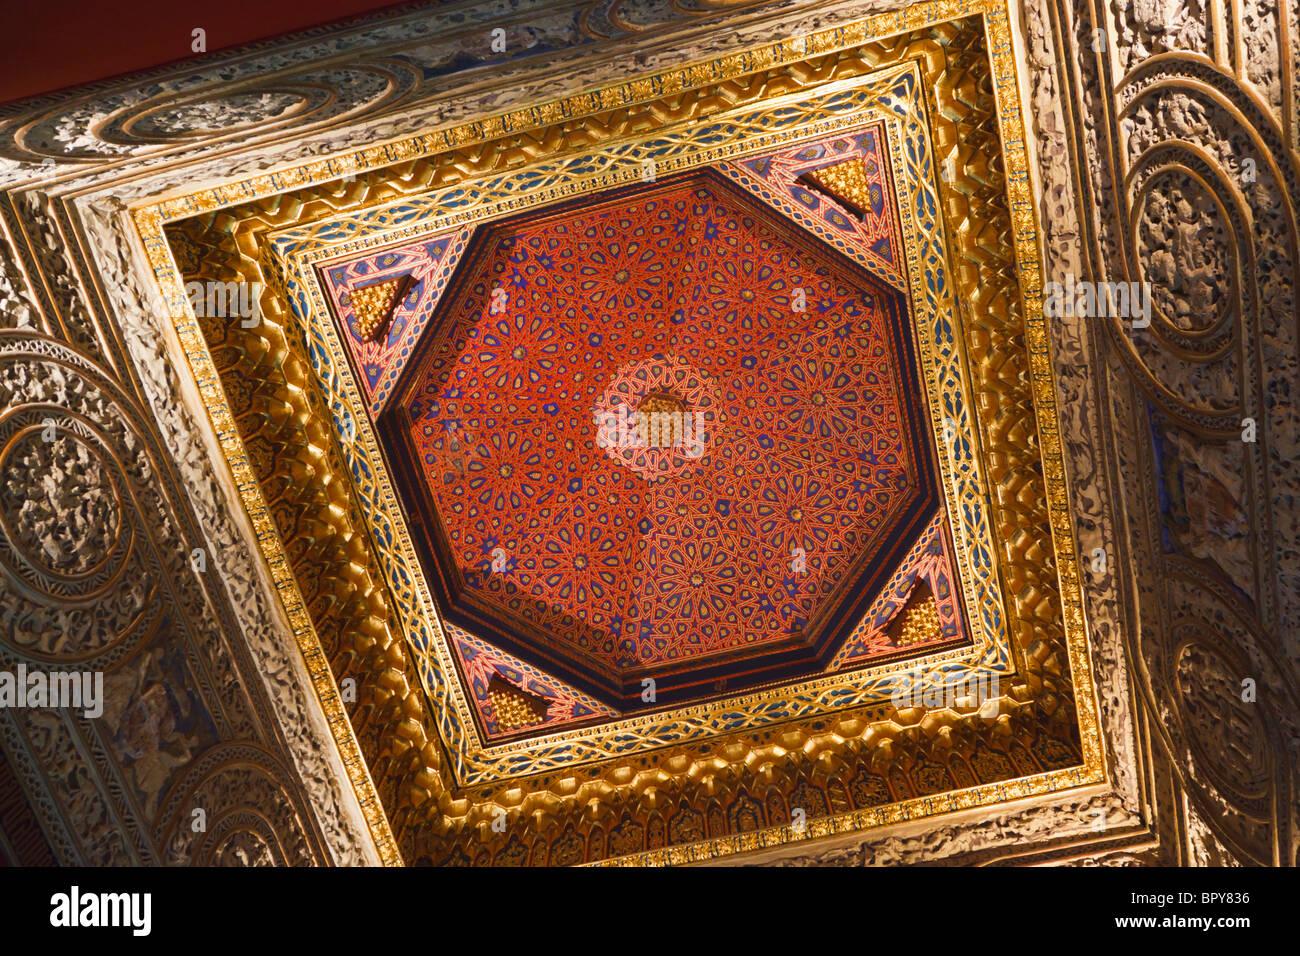 Segovia, Segovia Province, Spain. Throne room in the Alcazar. The Mudejar ceiling. - Stock Image